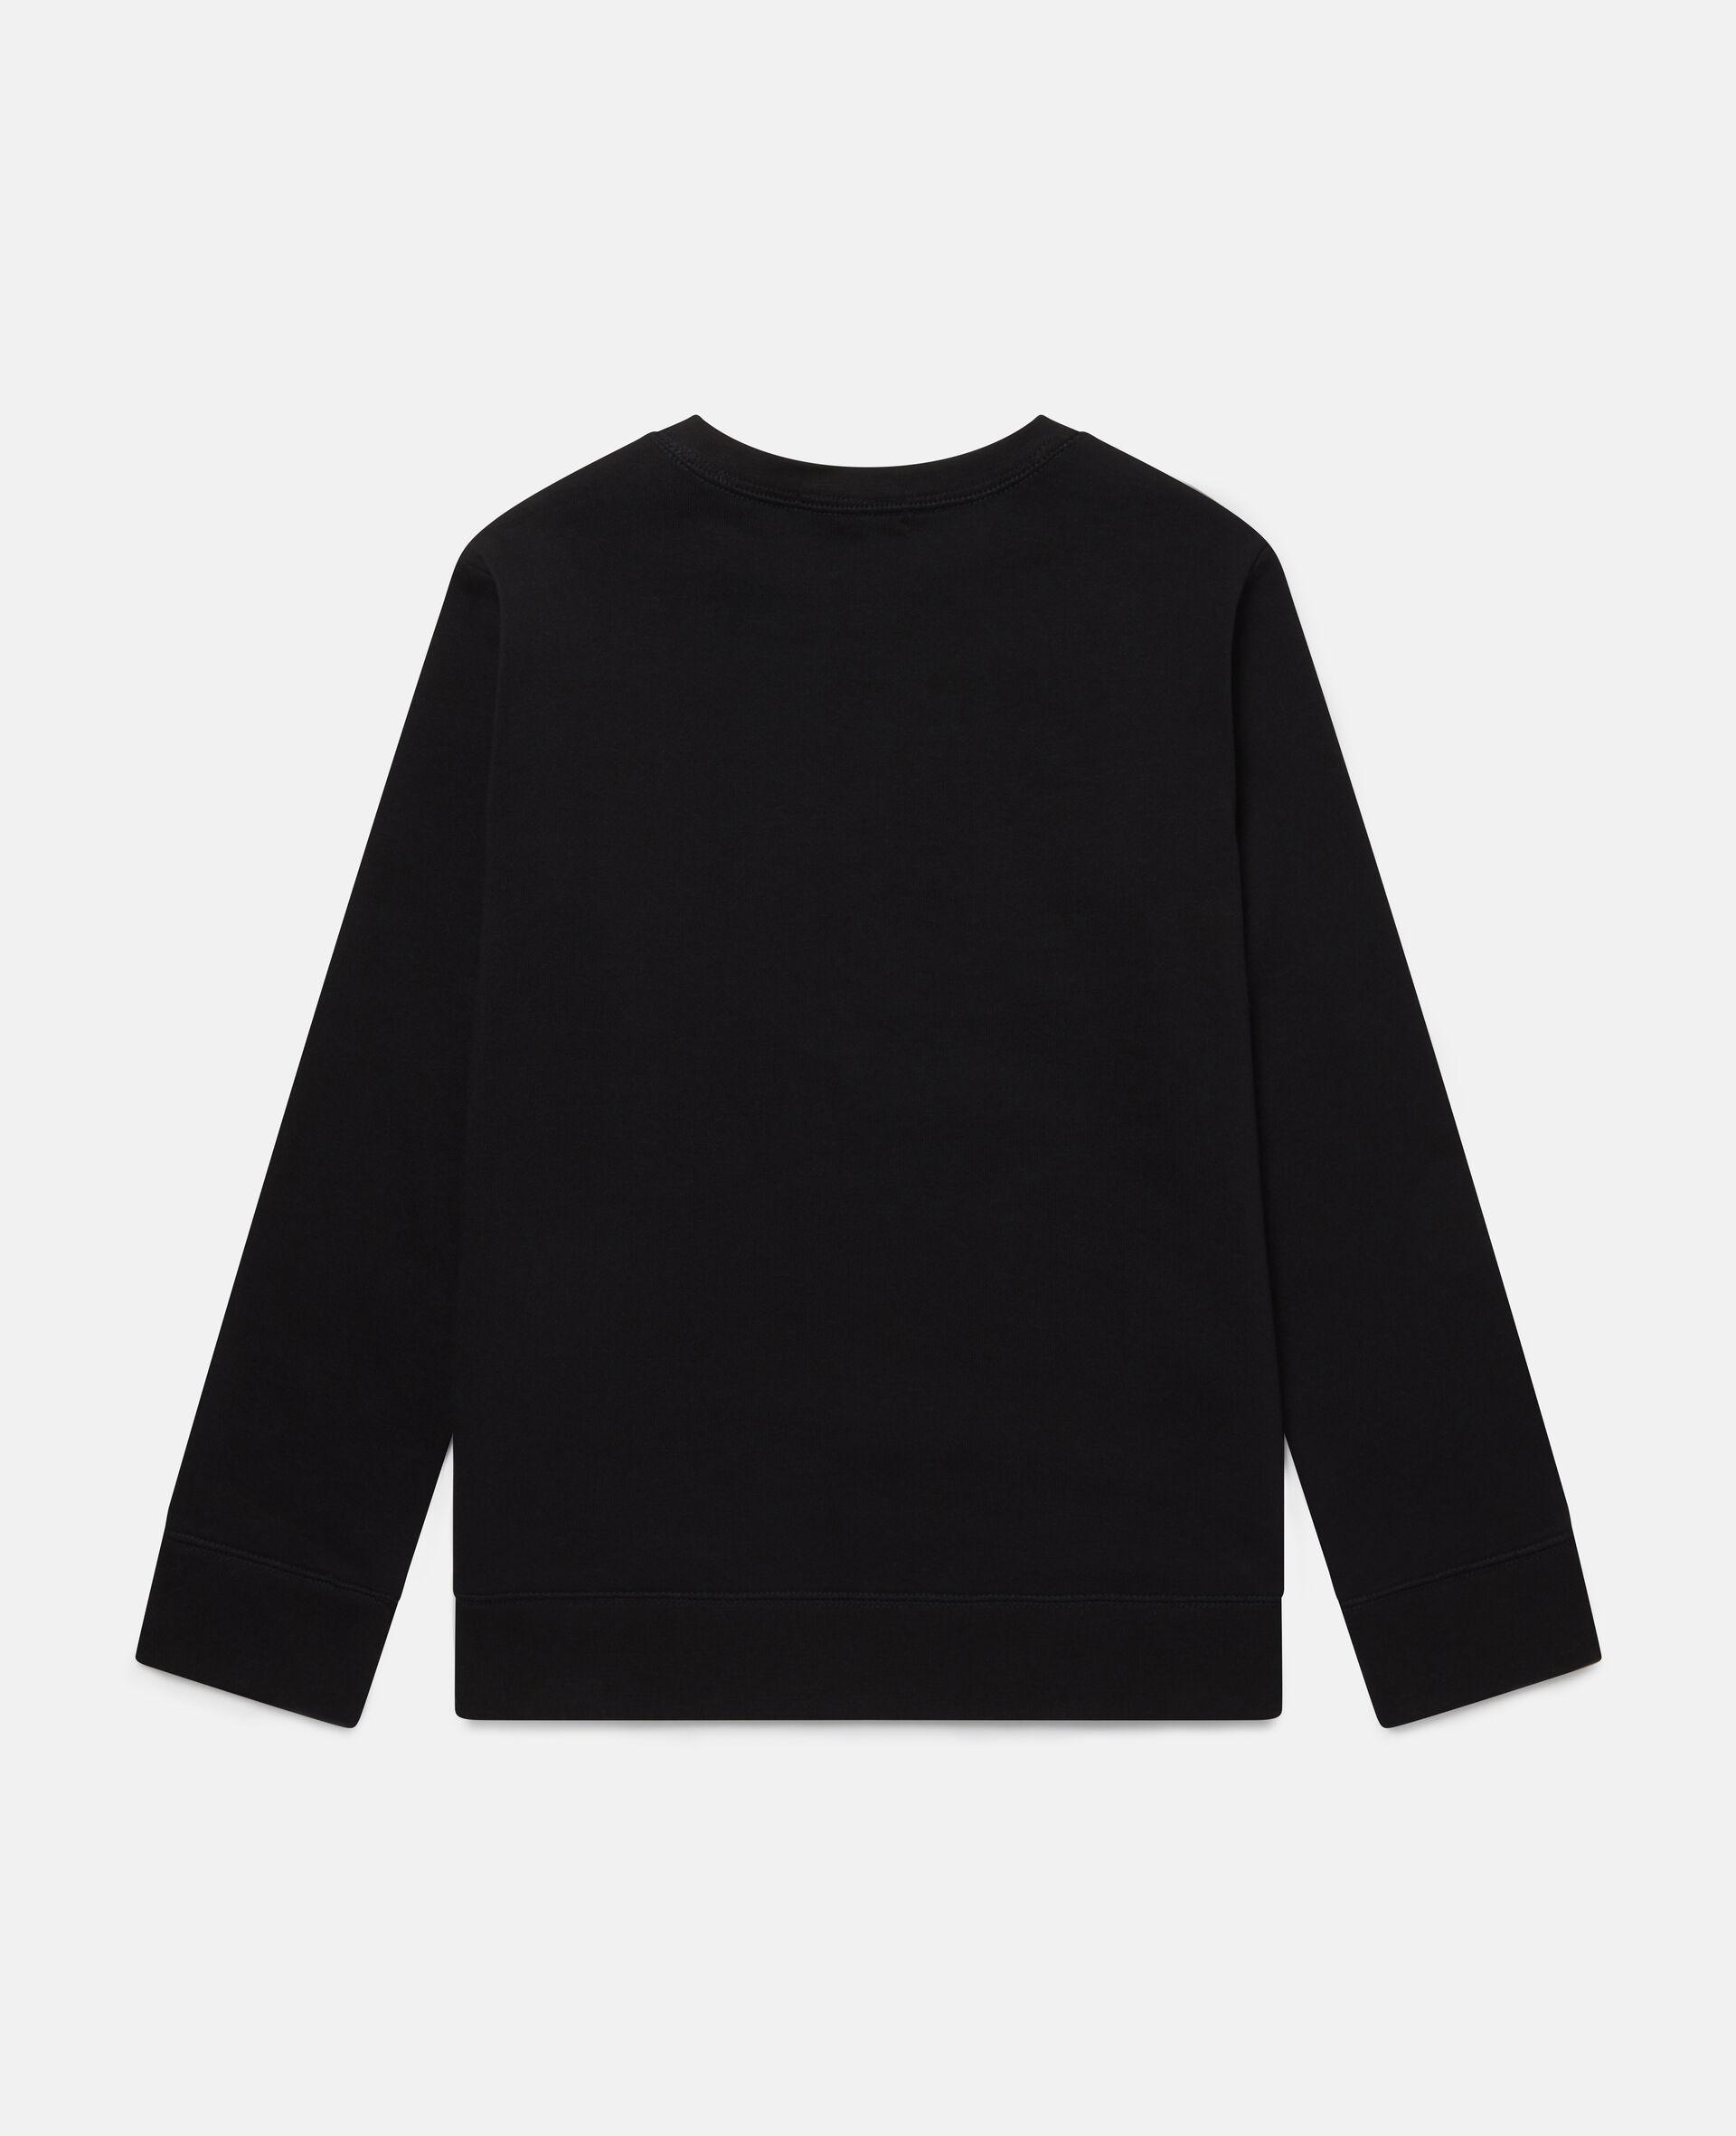 Fun Oversize Cotton Fleece Sweatshirt -Black-large image number 3